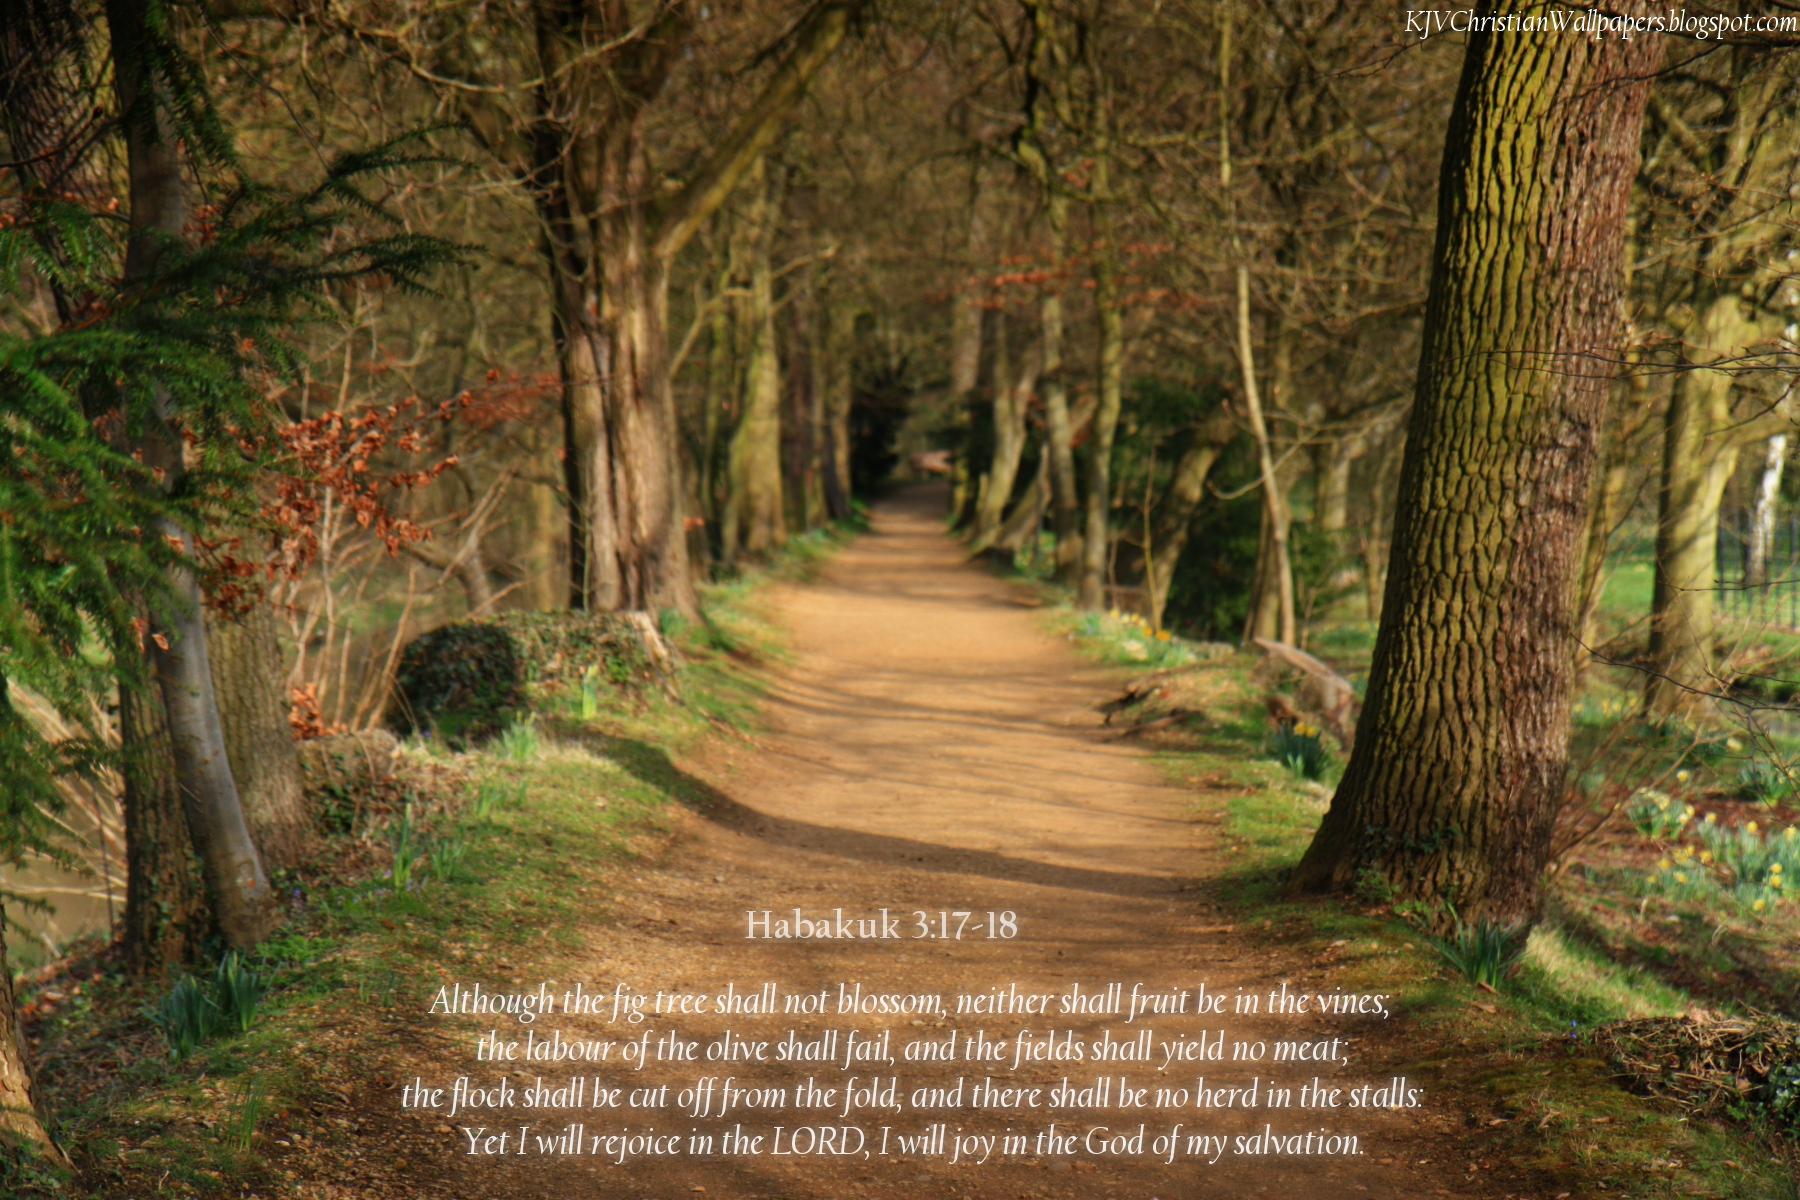 Habakkuk 3:17-18 - Joyful in God Wallpaper - Christian Wallpapers and ...